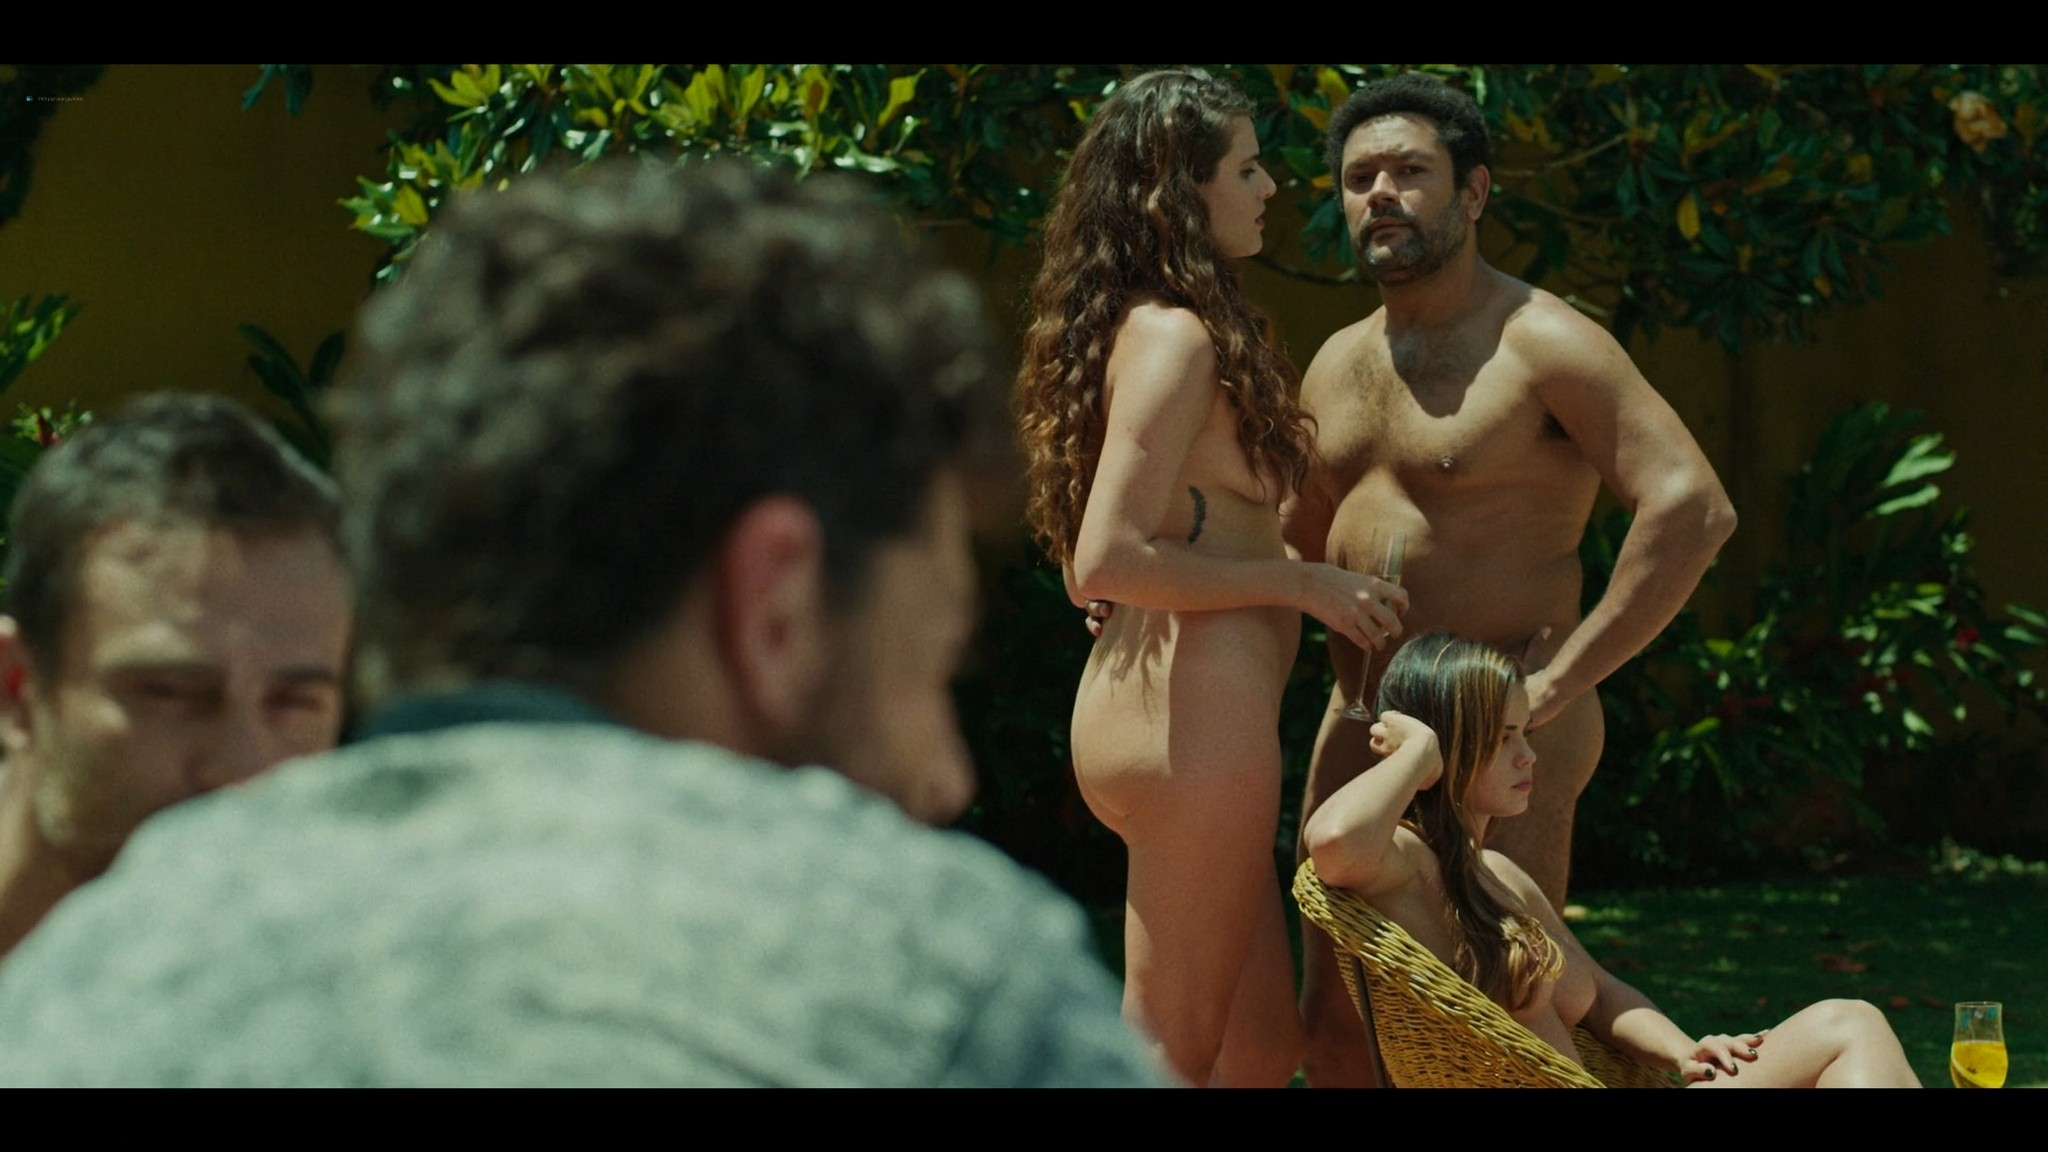 Natalia Lage nude sex Brunna Martins Juliana Bebe and oters nude too Hard 2021 s2e4 6 1080p Web 13